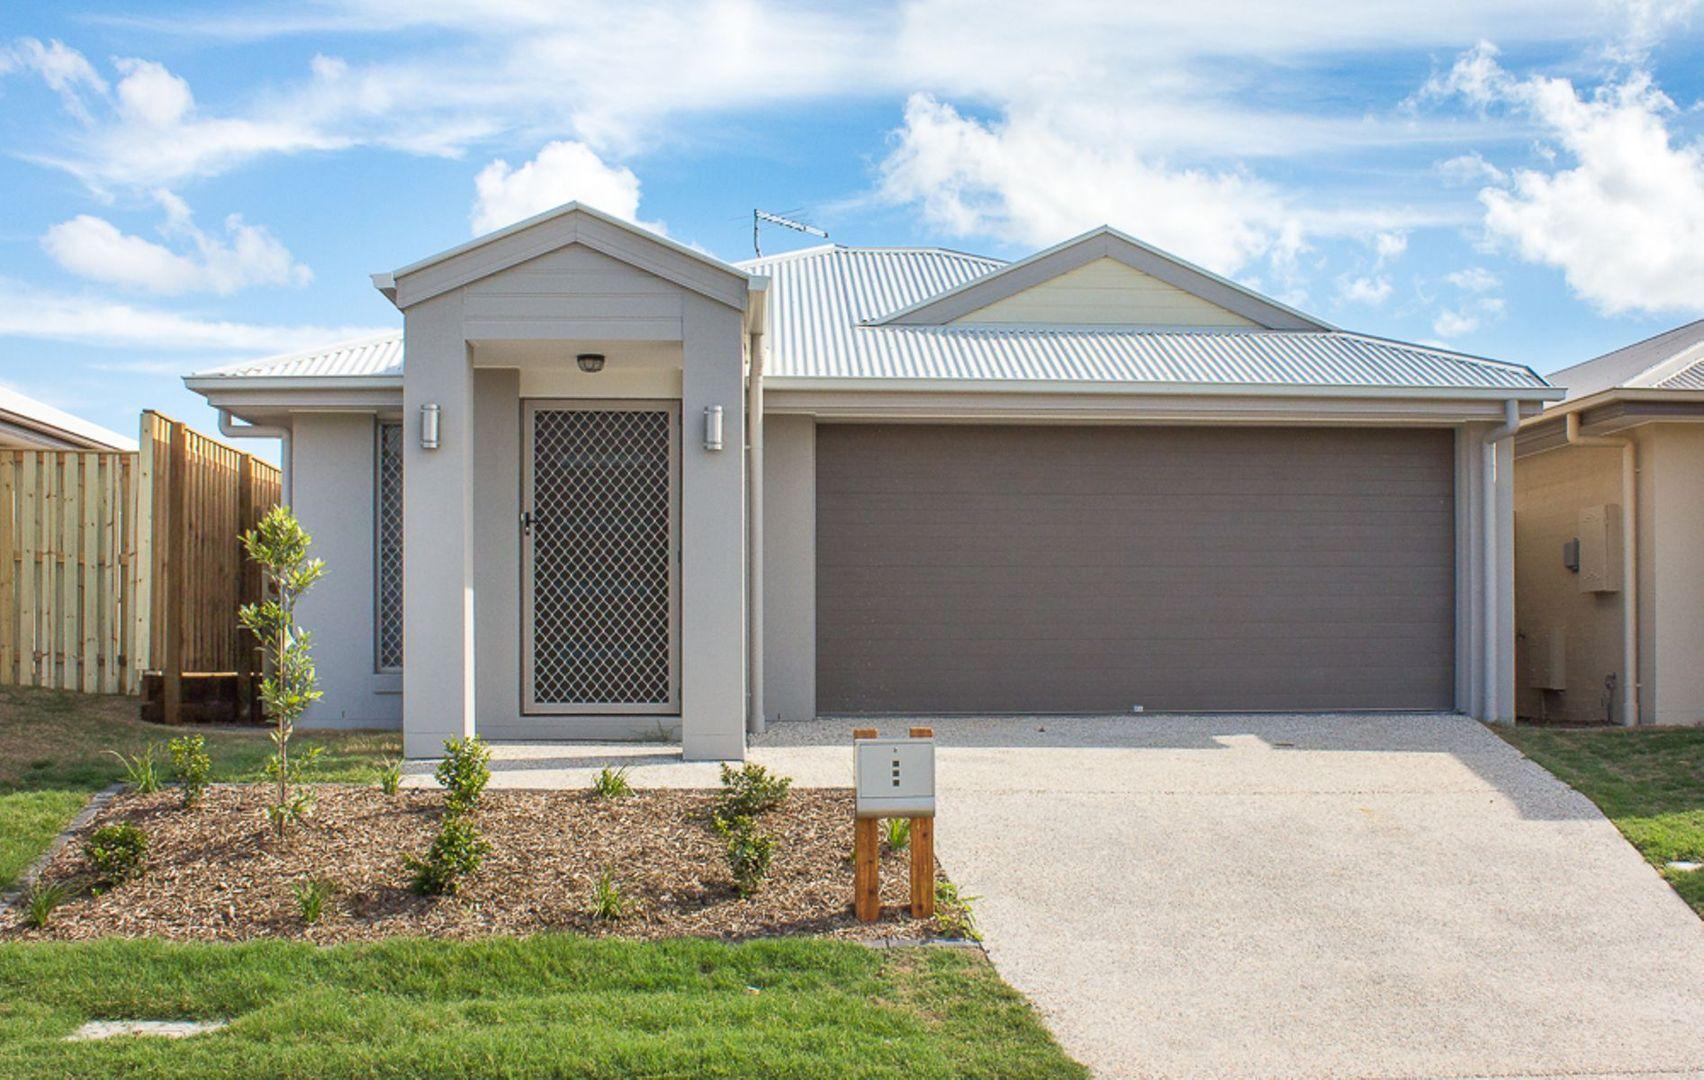 15 Corkwood Court, Coomera QLD 4209, Image 0